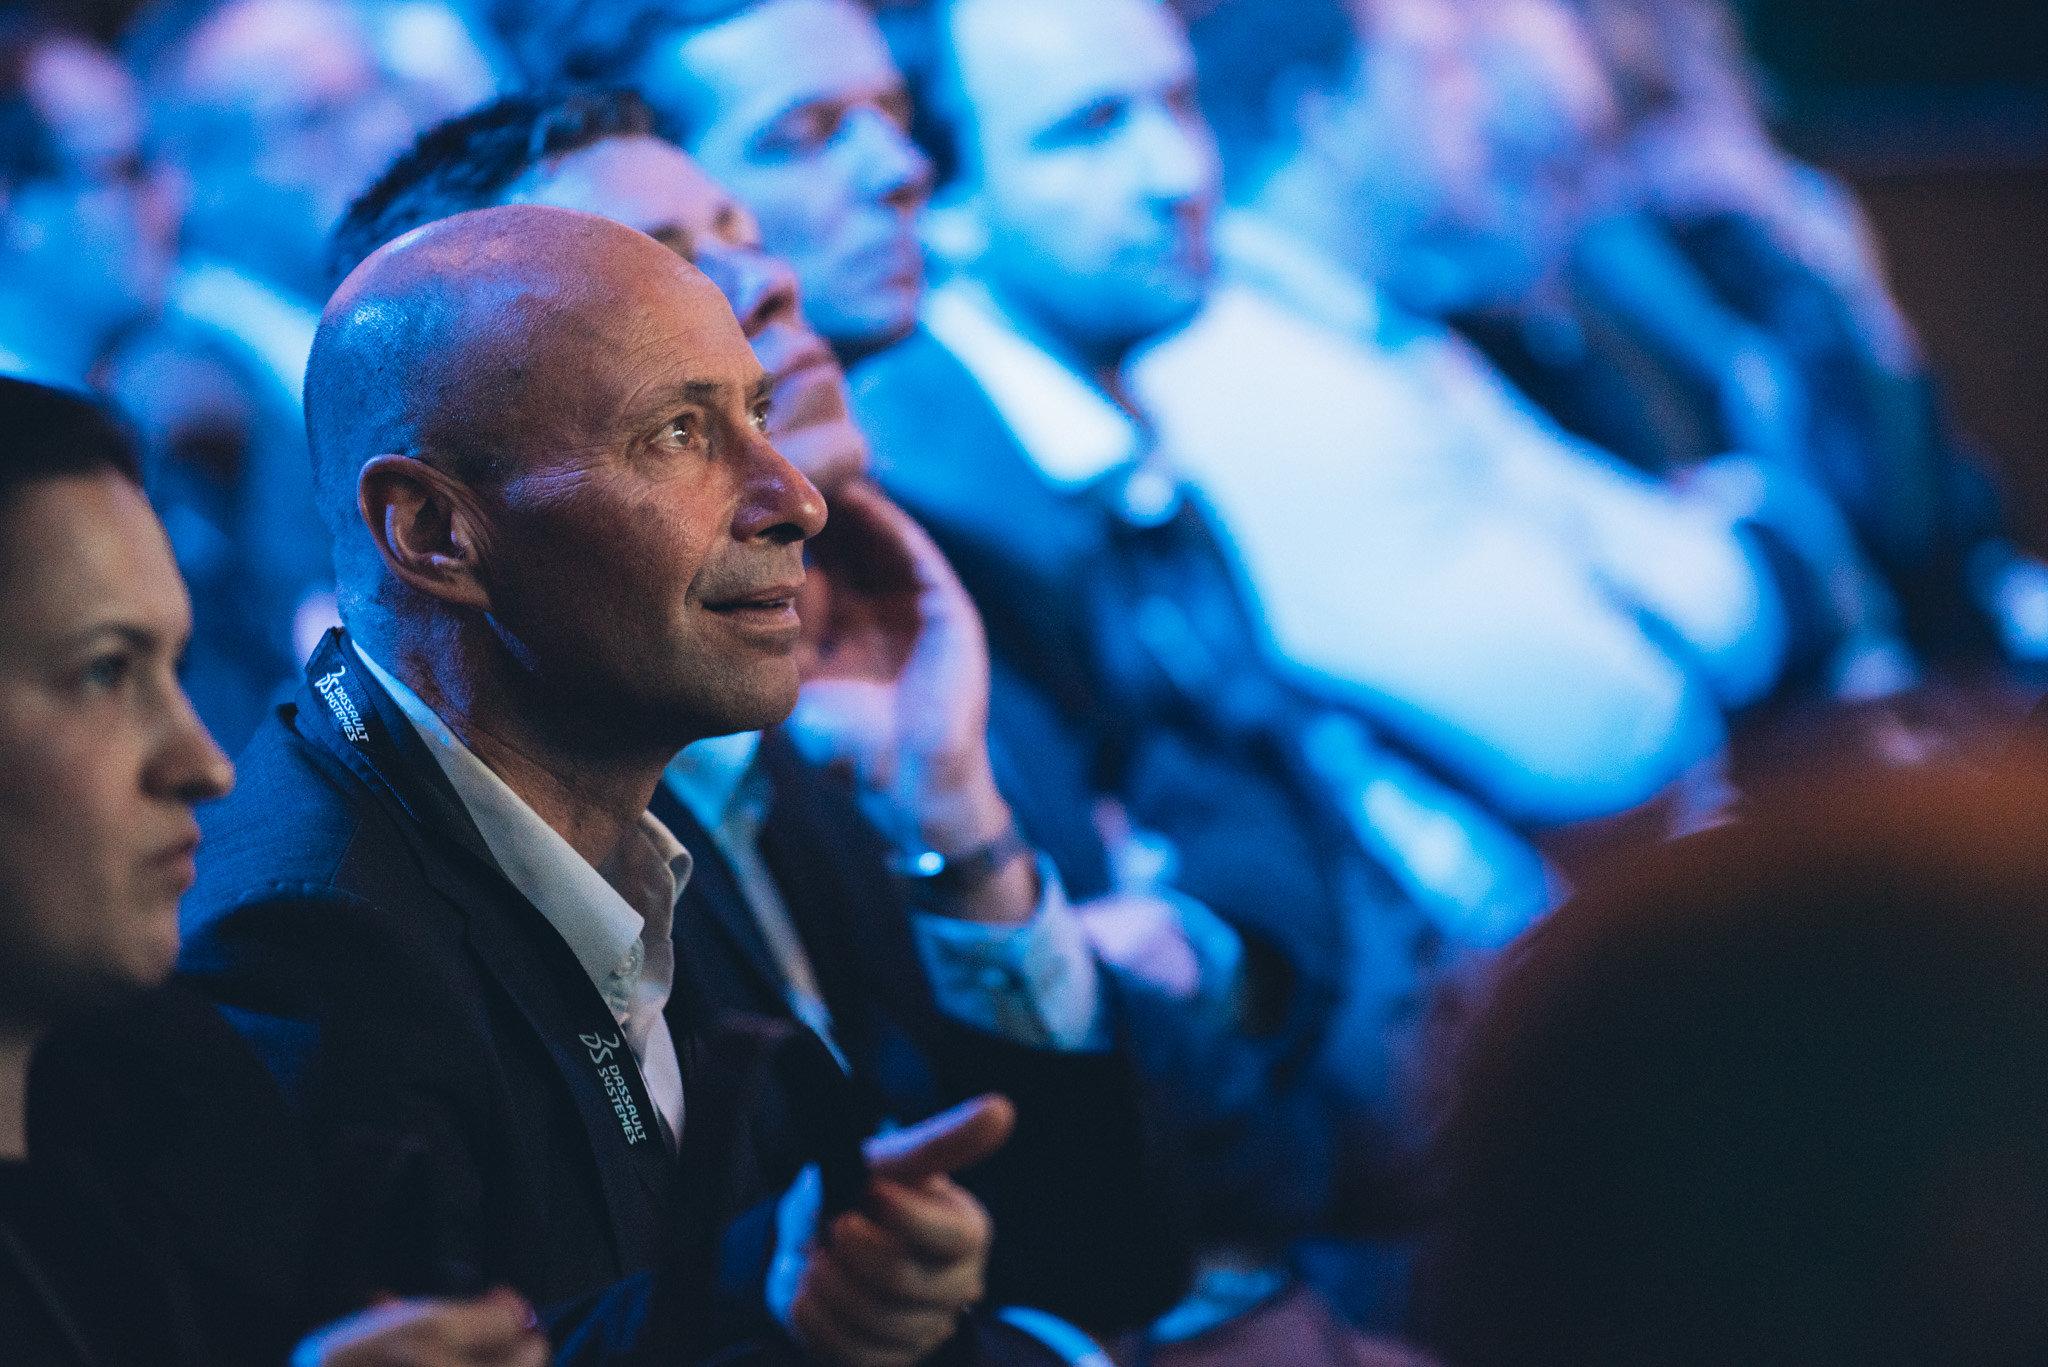 3DX_forum_event_highlights_rotterdam_presentations-39.jpg